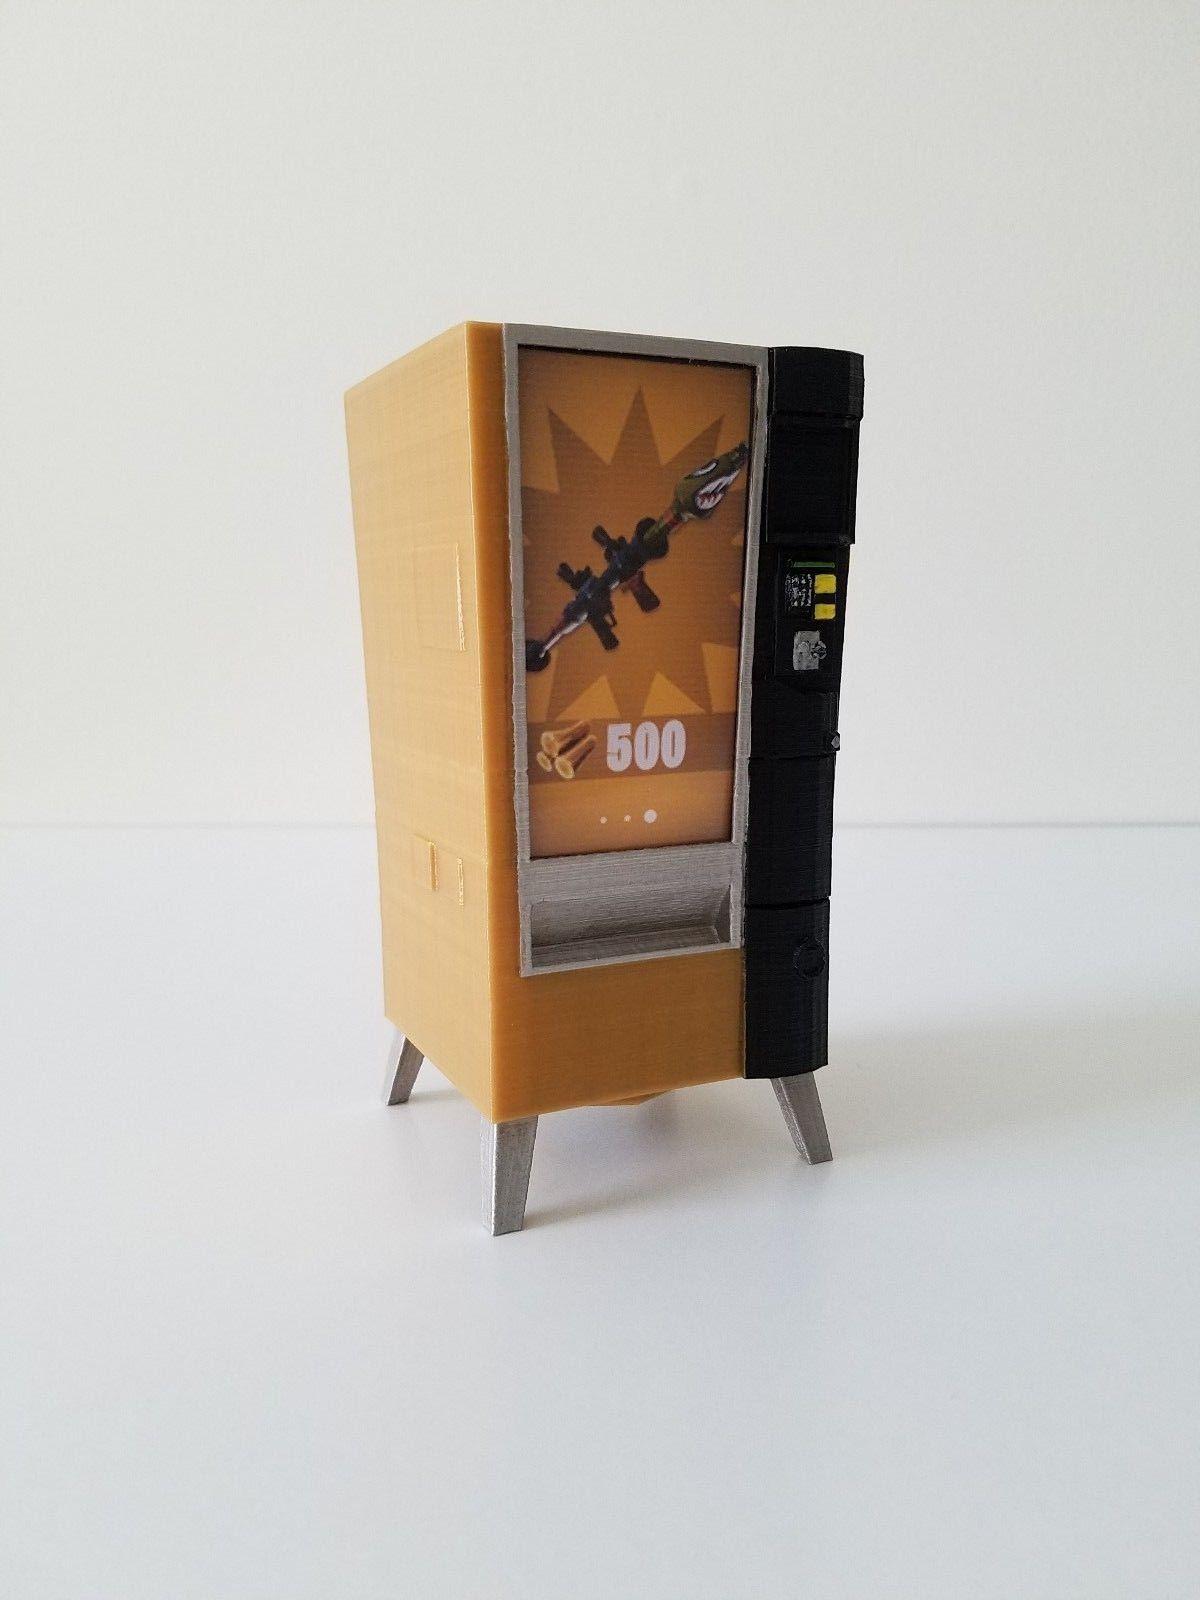 Fortnite Vending Machine Prop Custom Made Mini - Piggy, Coin Bank - V-bucks - Birthday Gift Epic Games 3